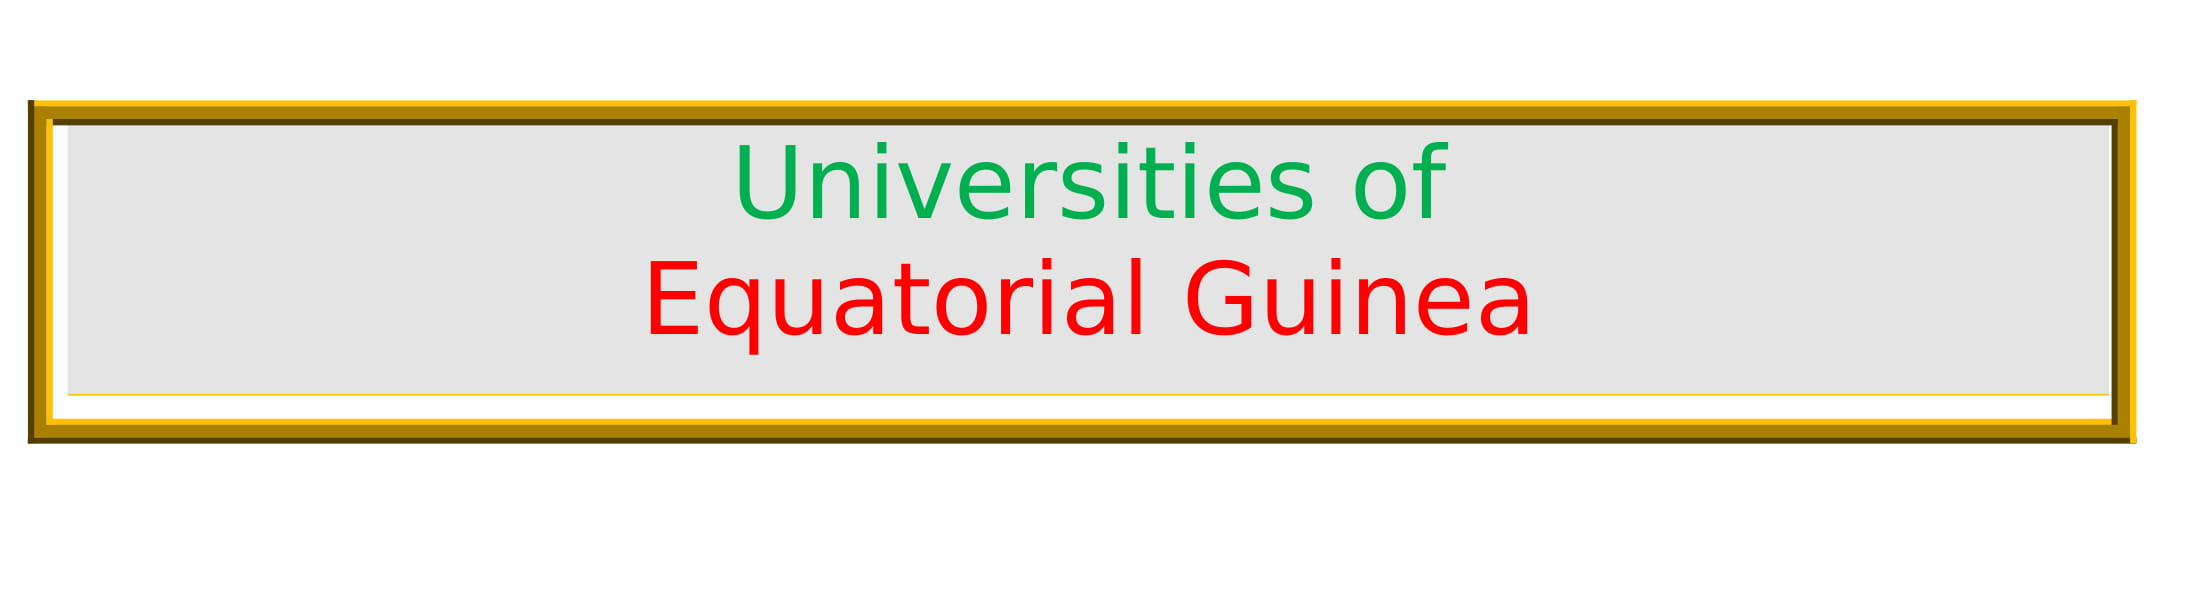 List of Universities in Equatorial Guinea